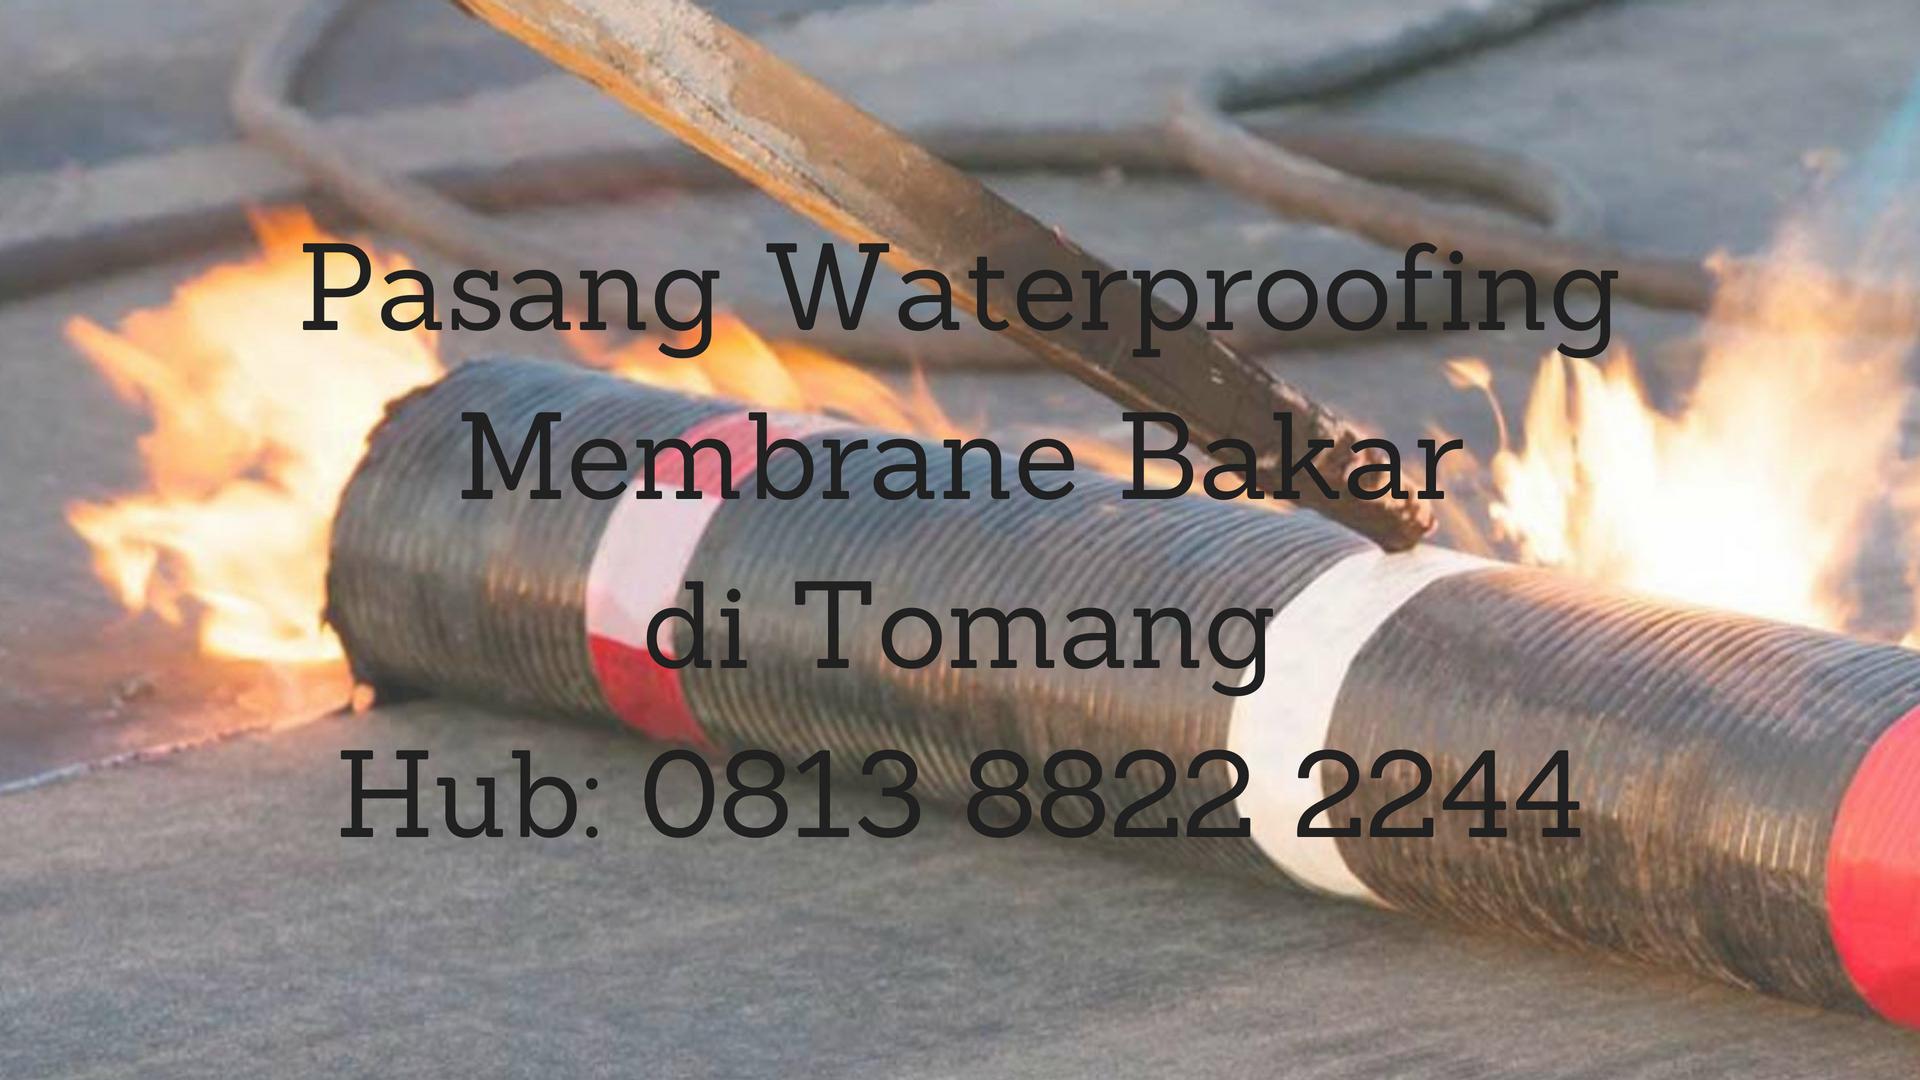 PASANG WATERPROOFING MEMBRANE BAKAR DI TOMANG.  HUB : 08138822 2244